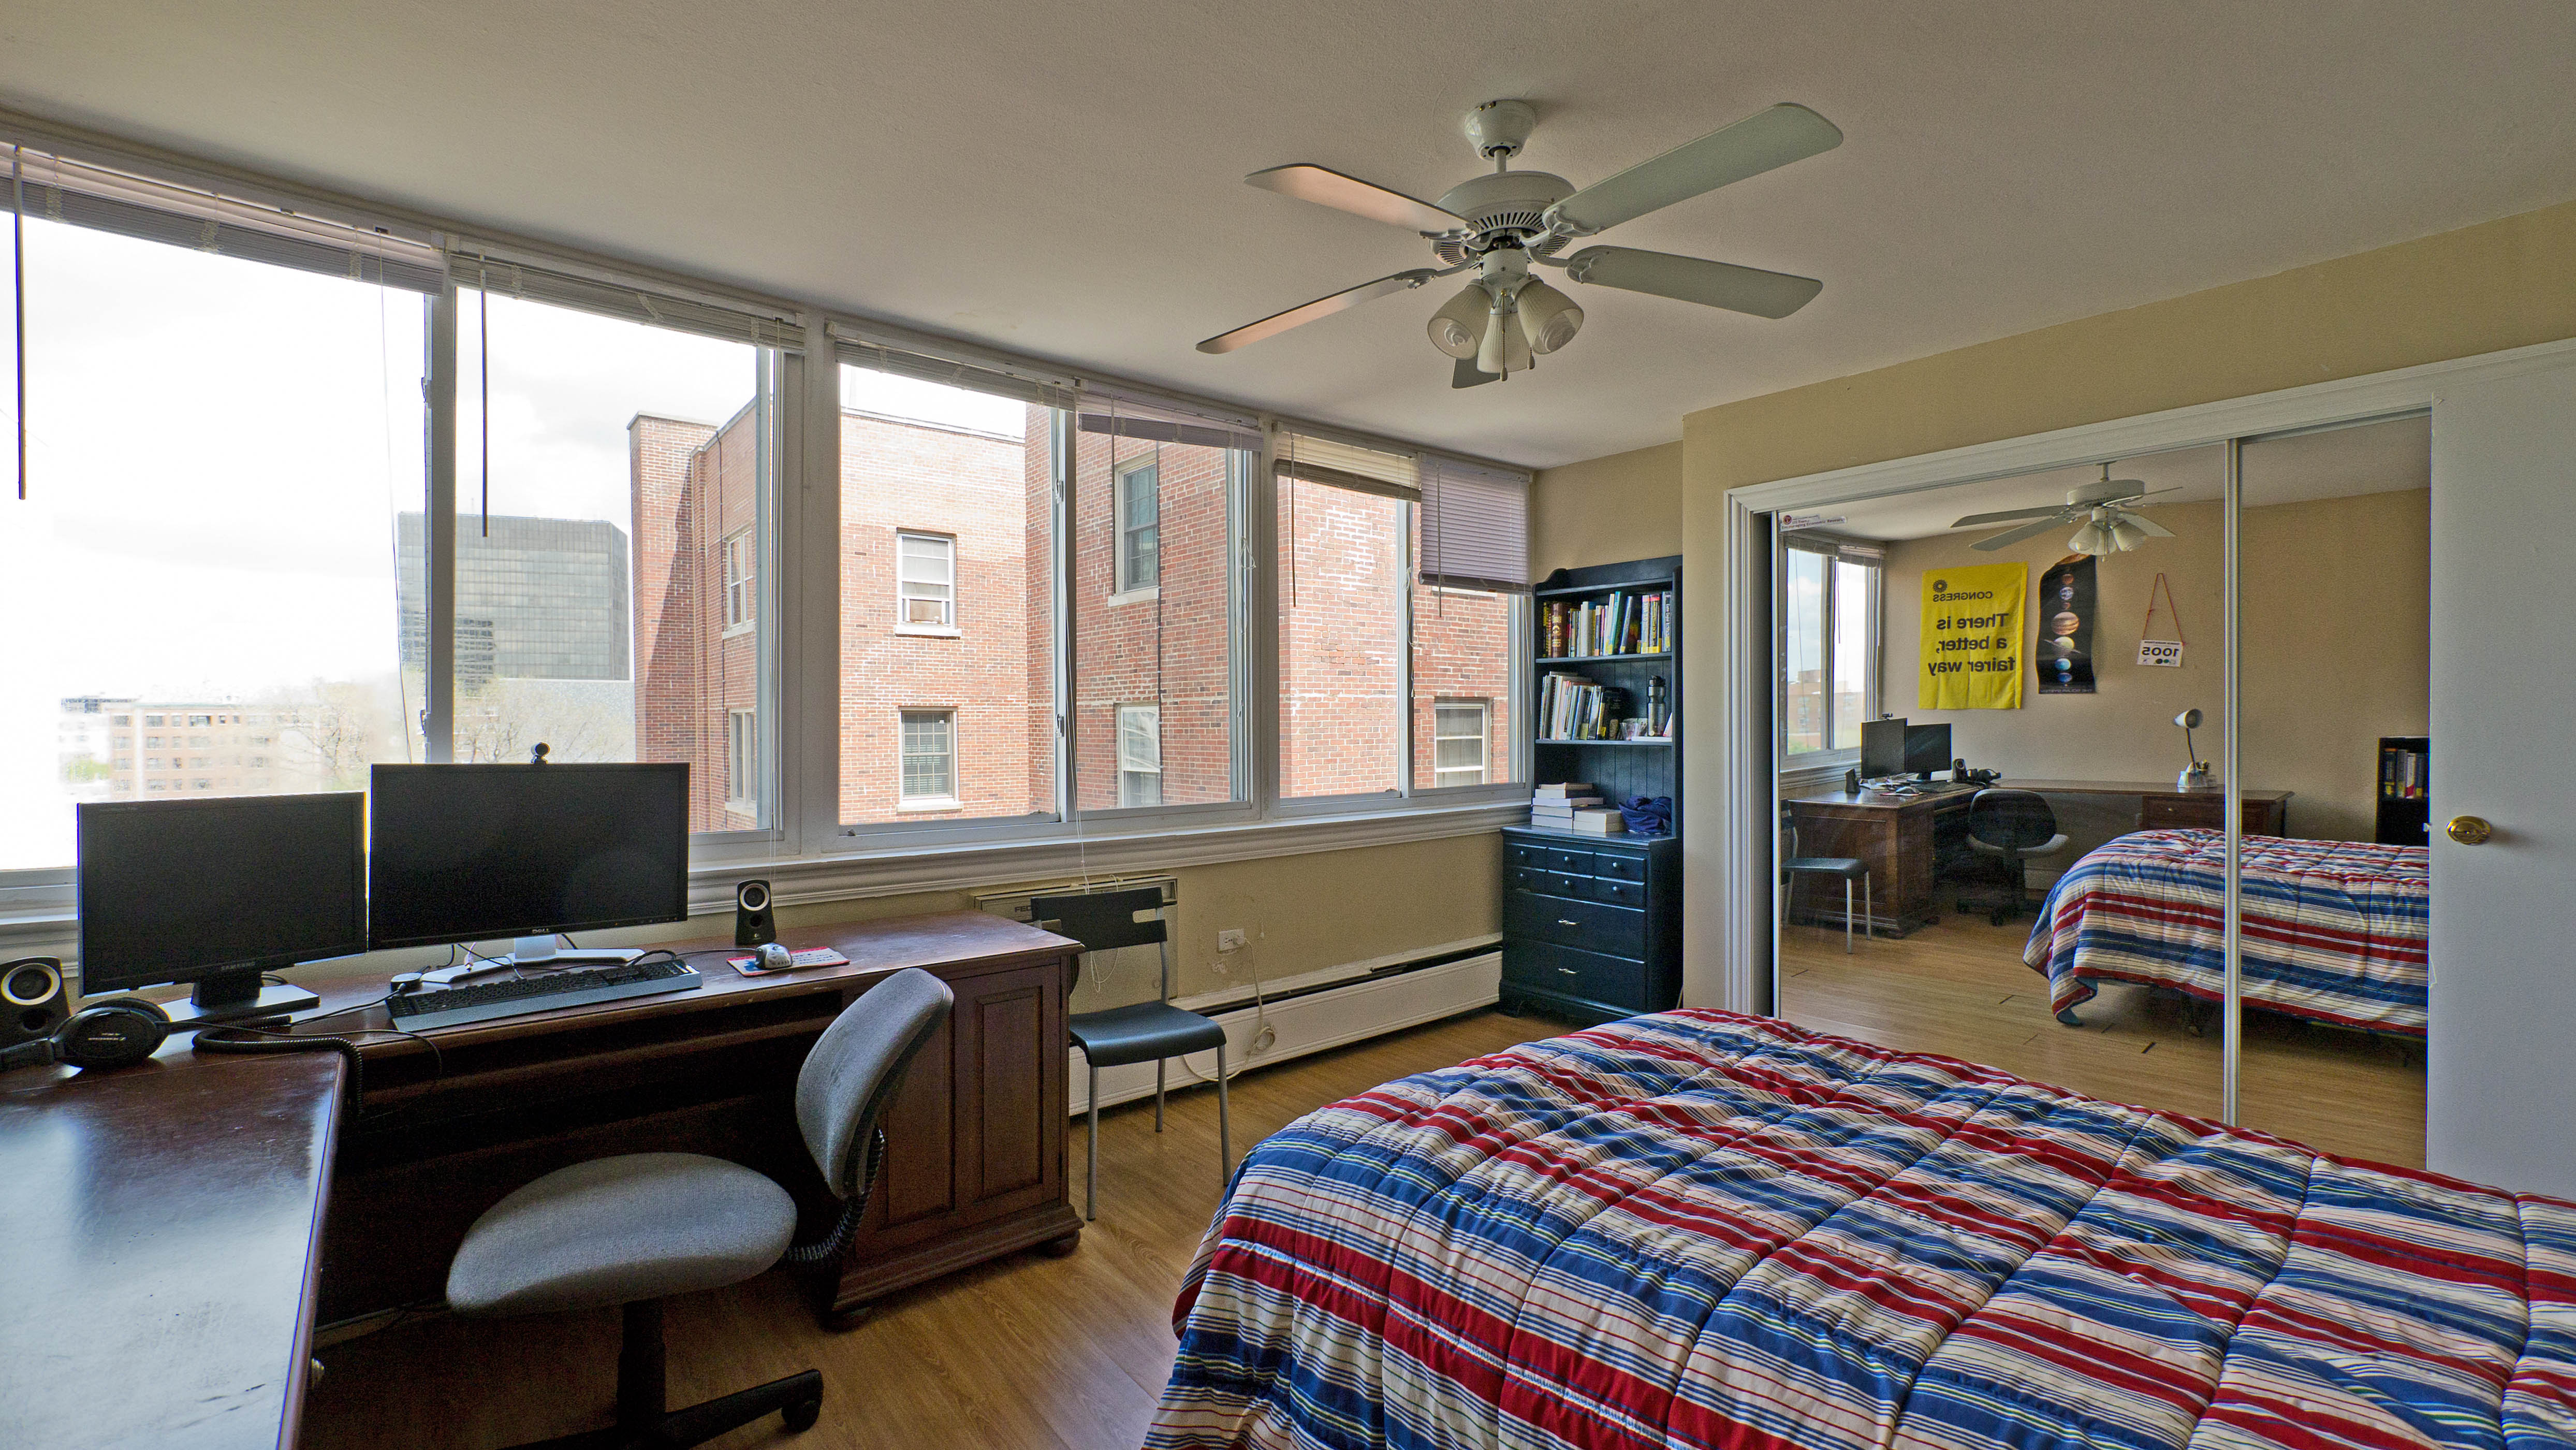 Evanston apartment review 1420 Chicago Ave – YoChicago